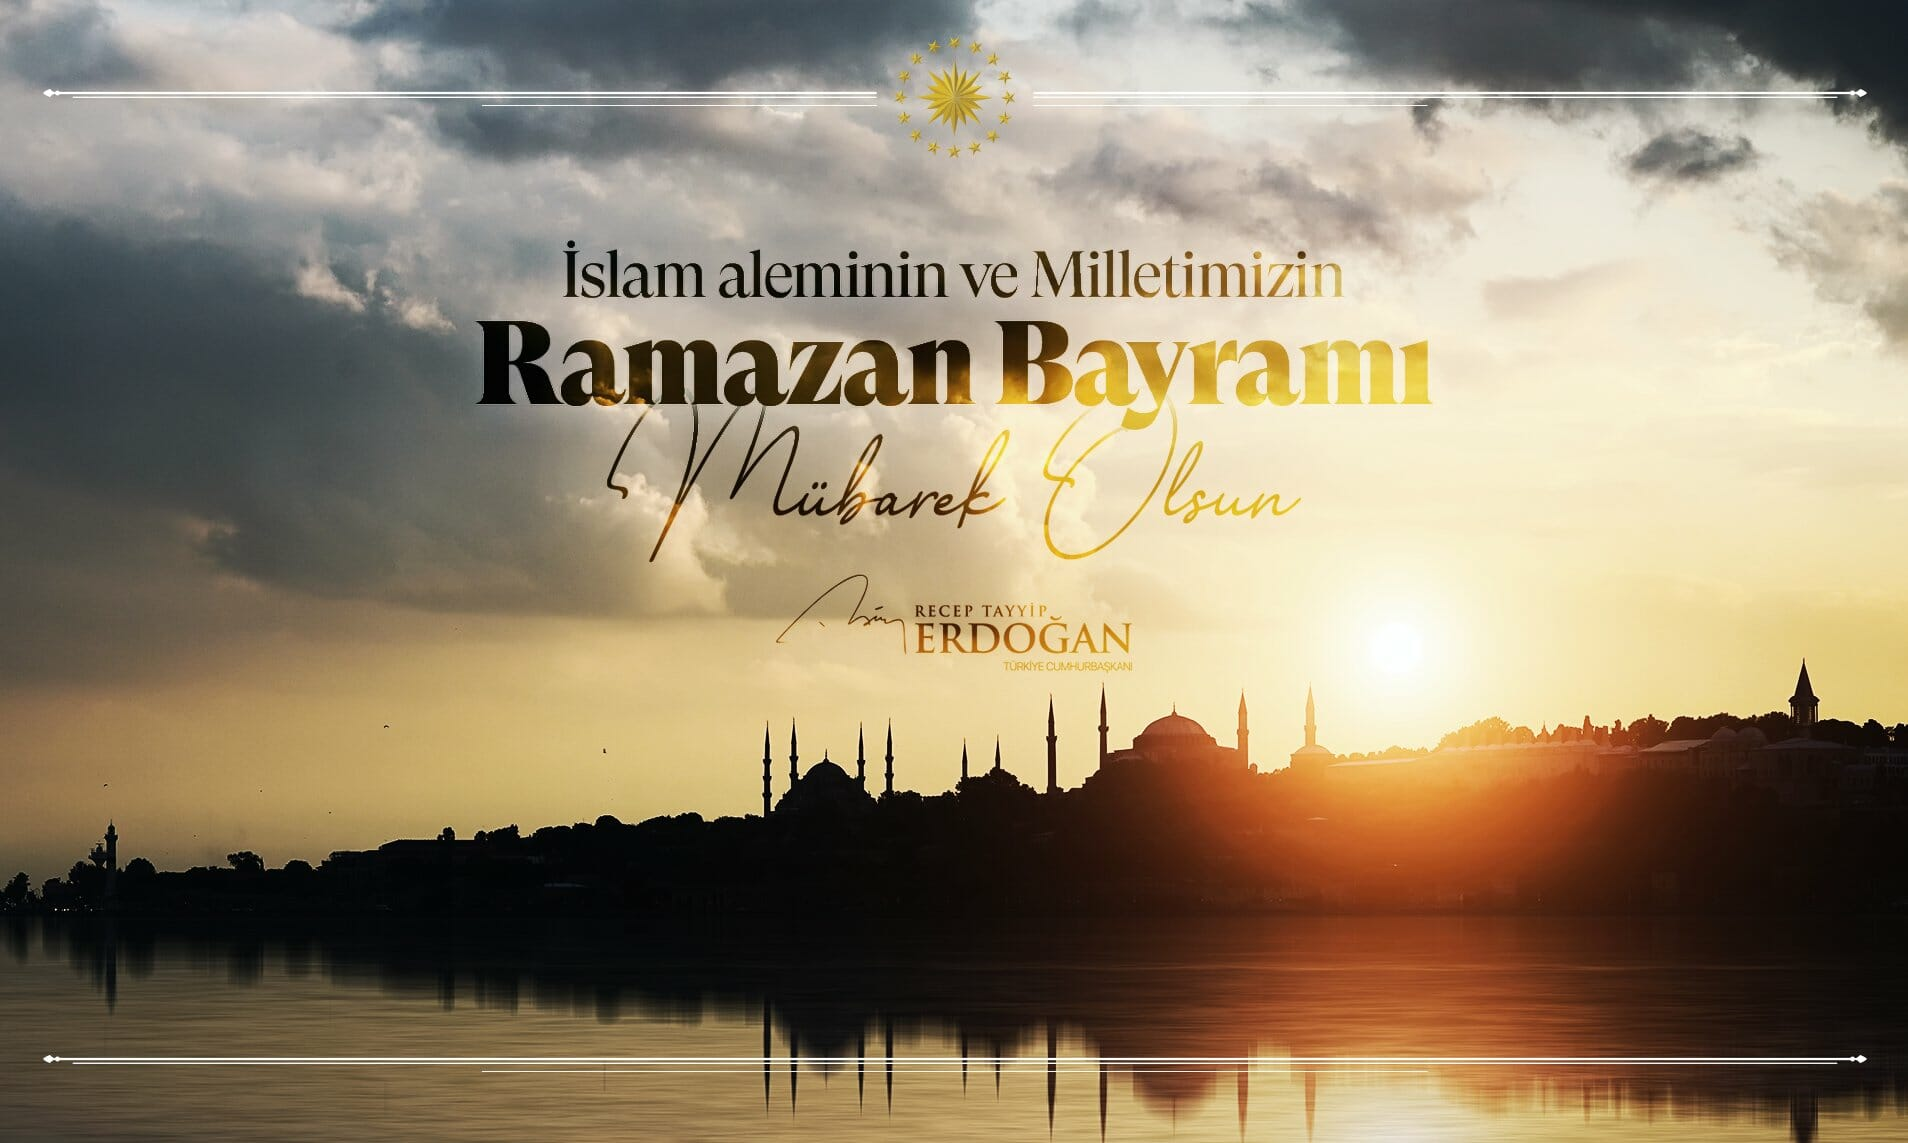 EYvfC7DWAAAGQOi - الرئيس أردوغان يهنئ العالم الإسلامي بعيد الفطر